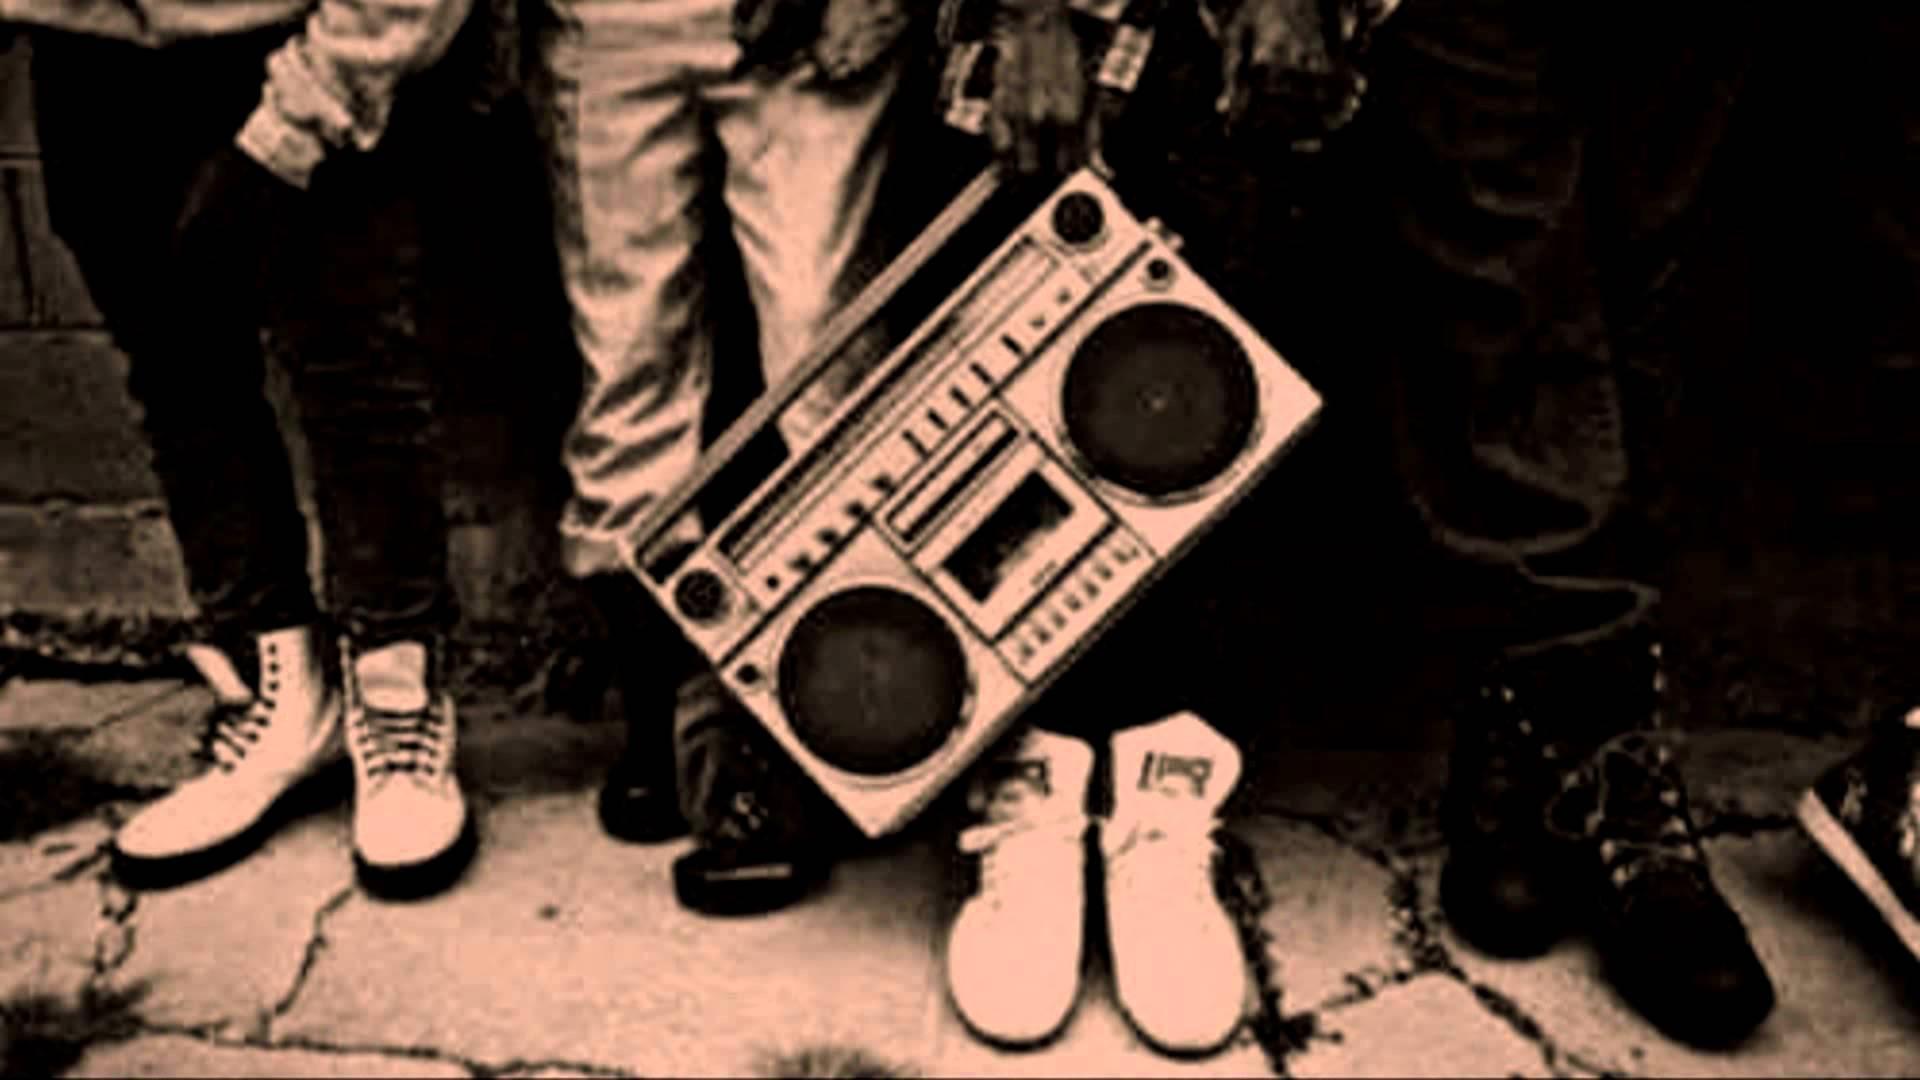 Top 5 Old School Hip-Hop Songs